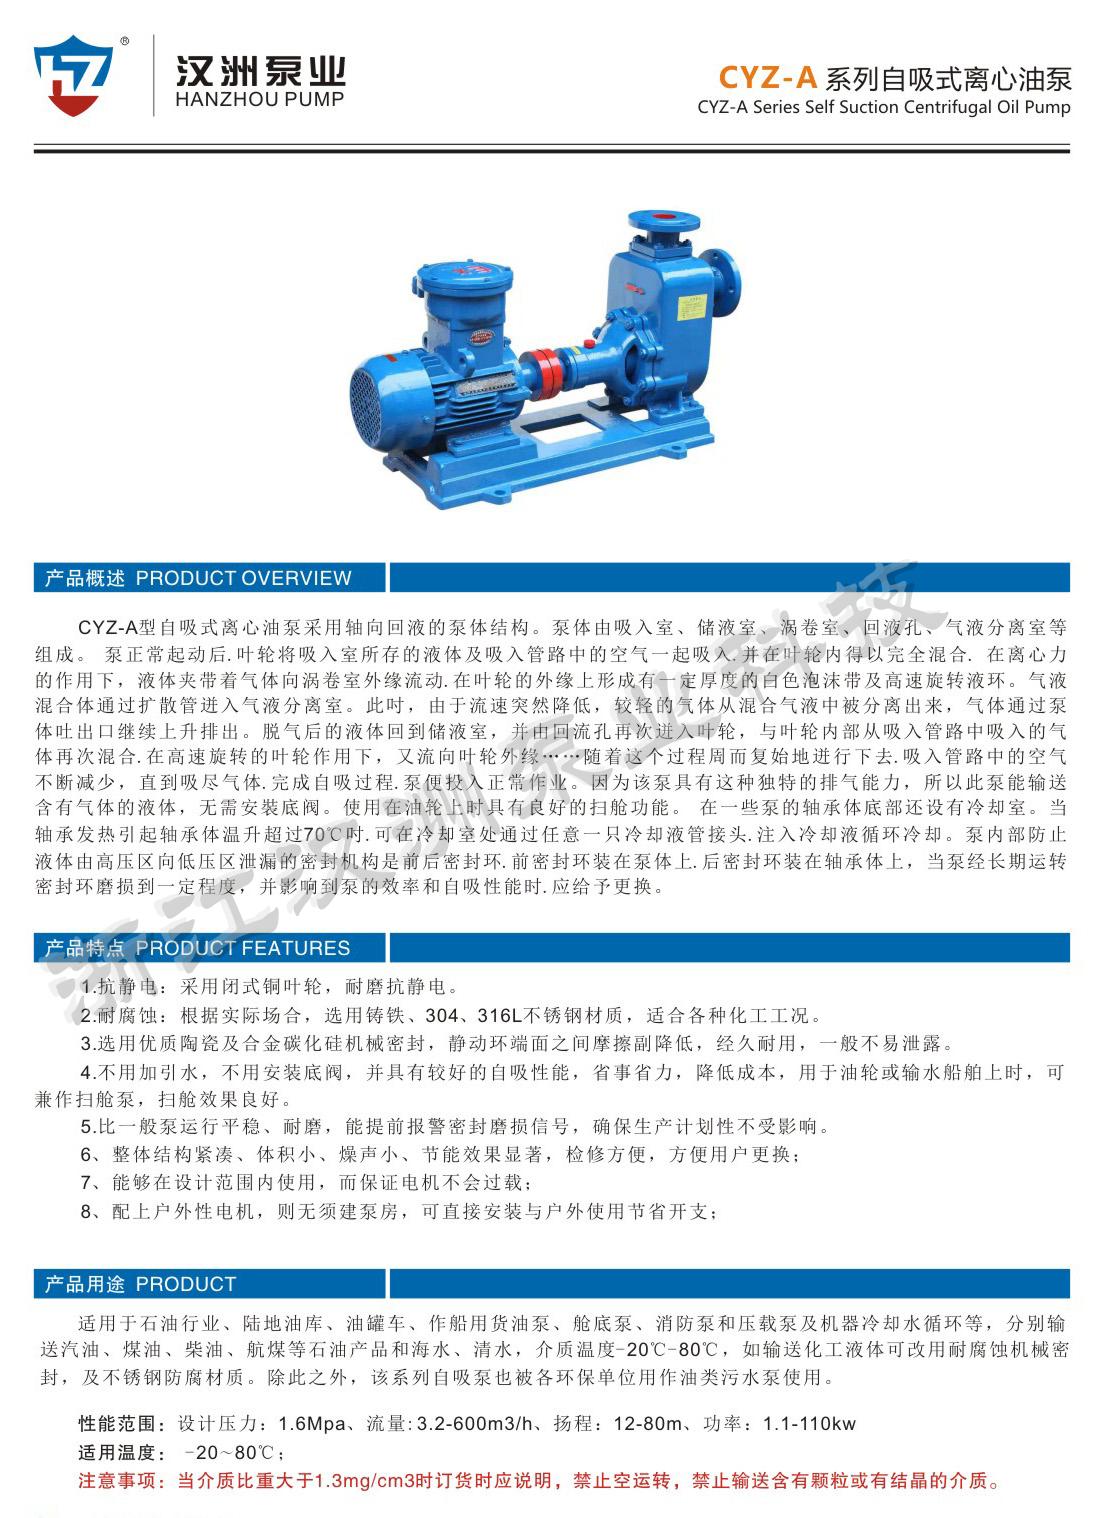 CYZ-A系列自吸式離心油泵